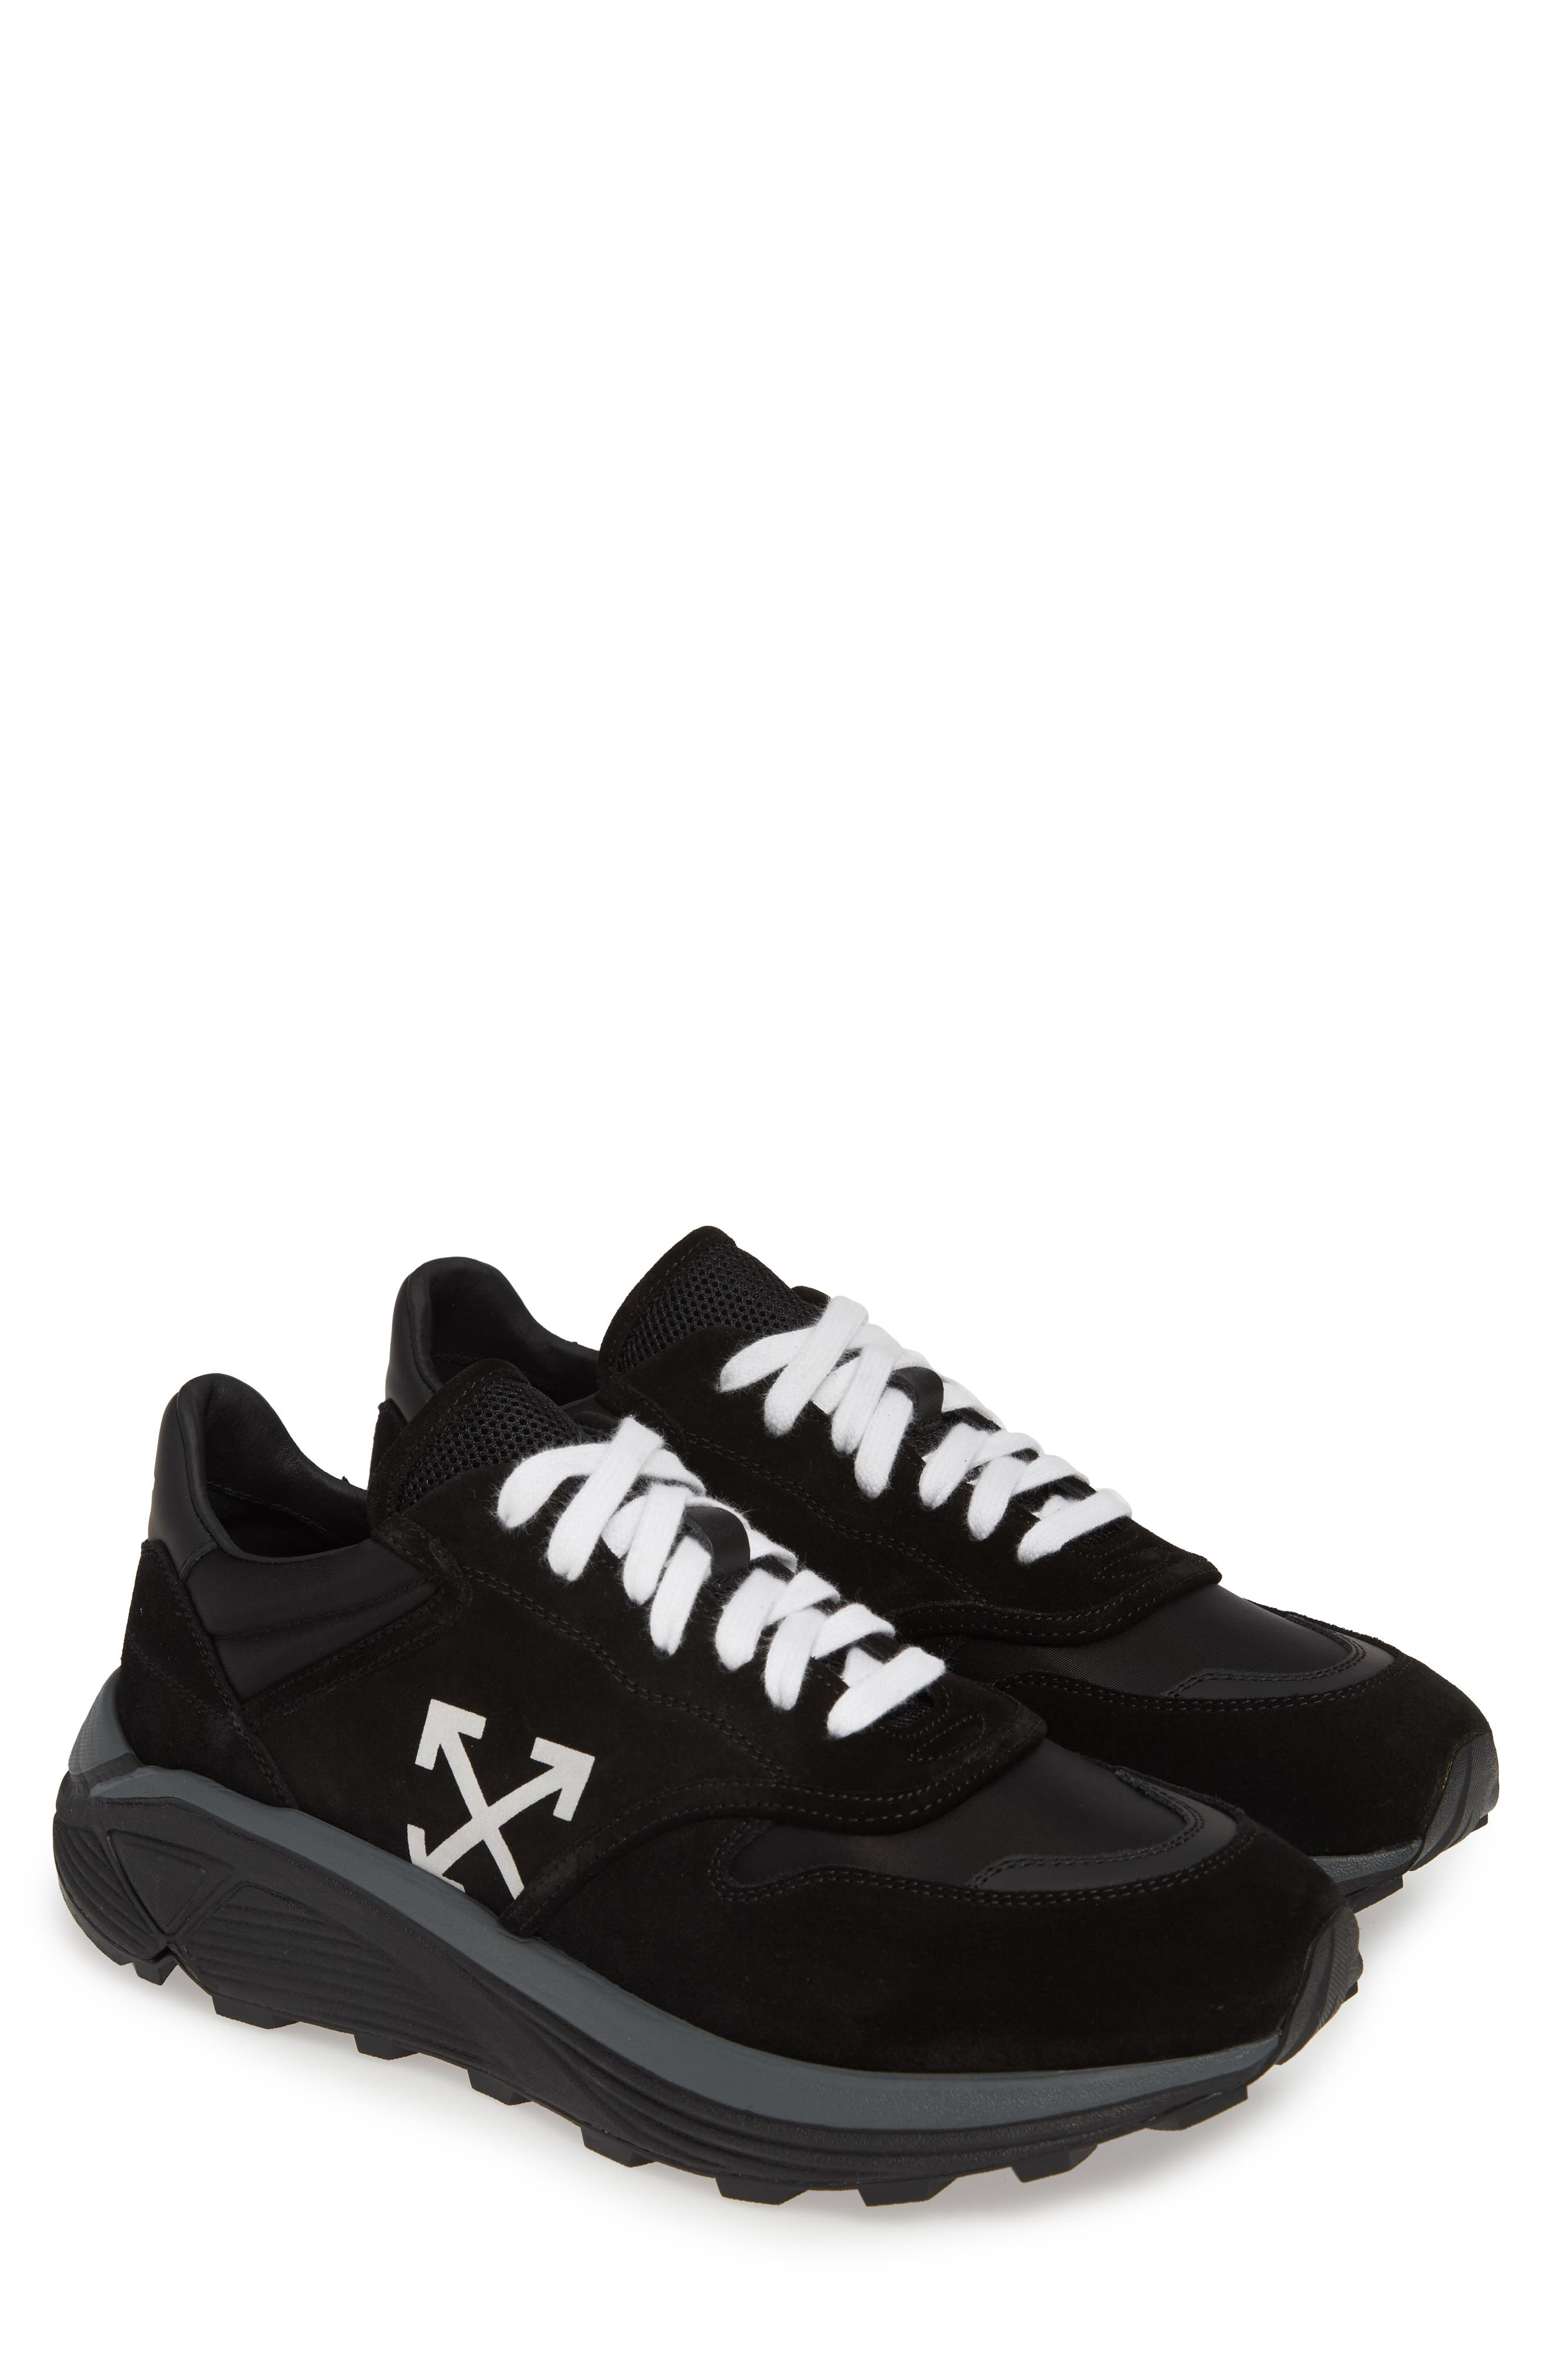 Jogger Sneaker,                             Alternate thumbnail 2, color,                             BLACK/ WHITE